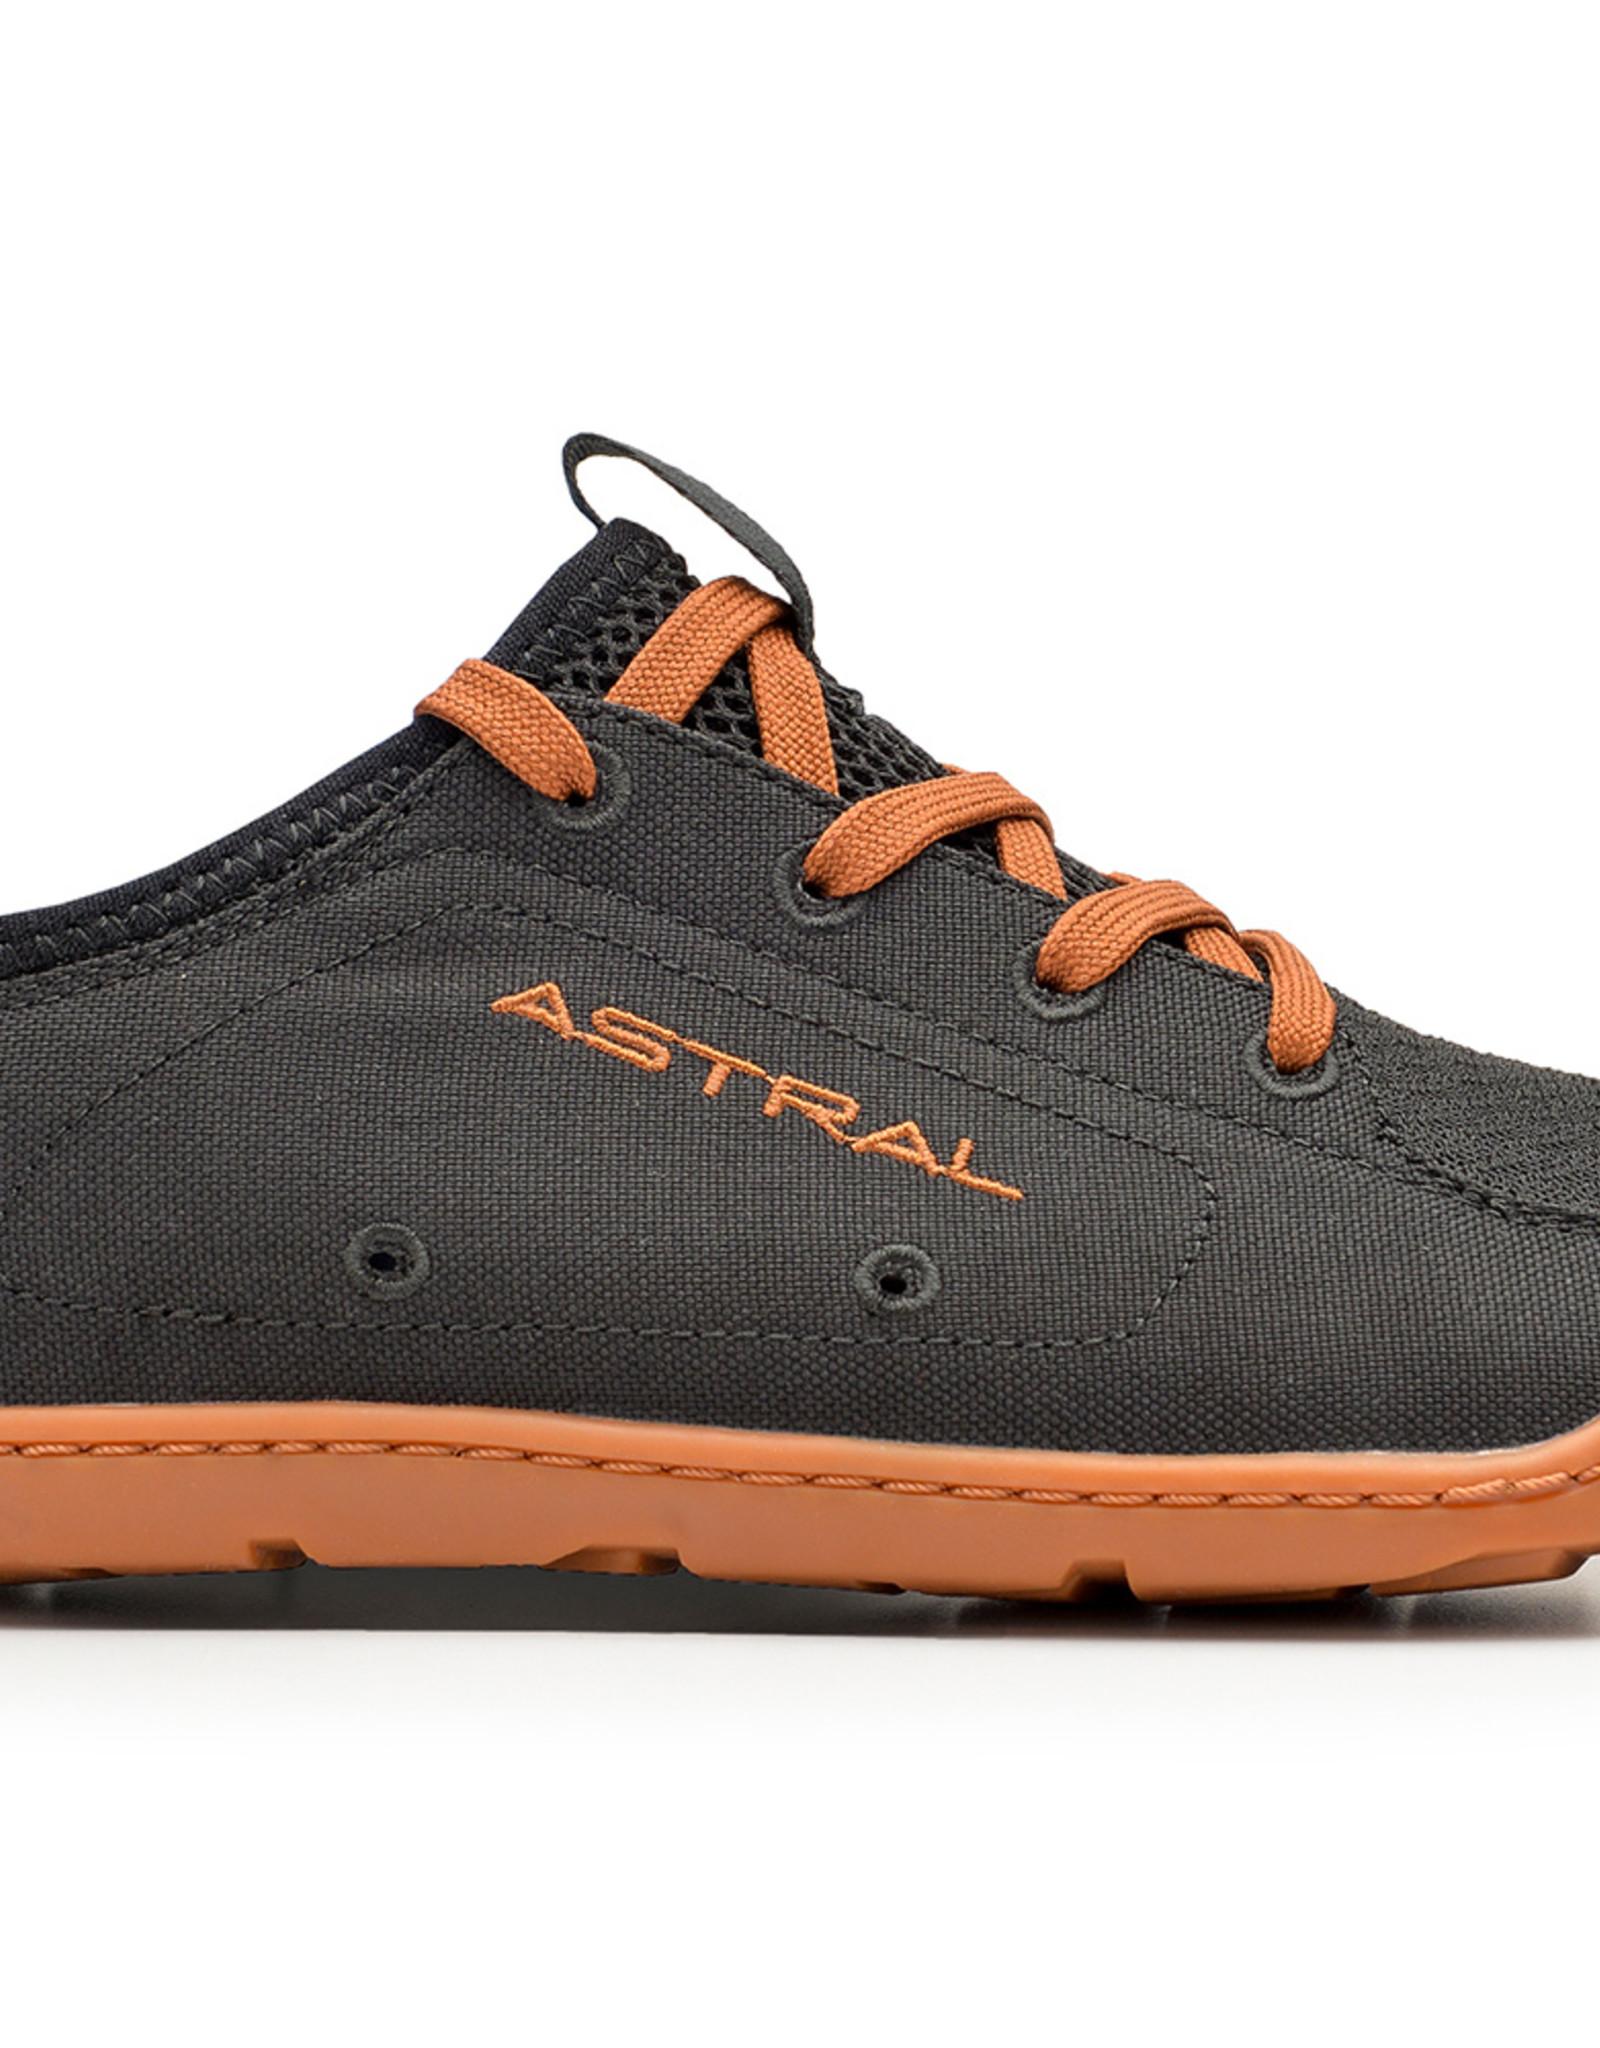 Astral MEN'S ASTRAL LOYAK WATER SHOE-BLACK/BROWN